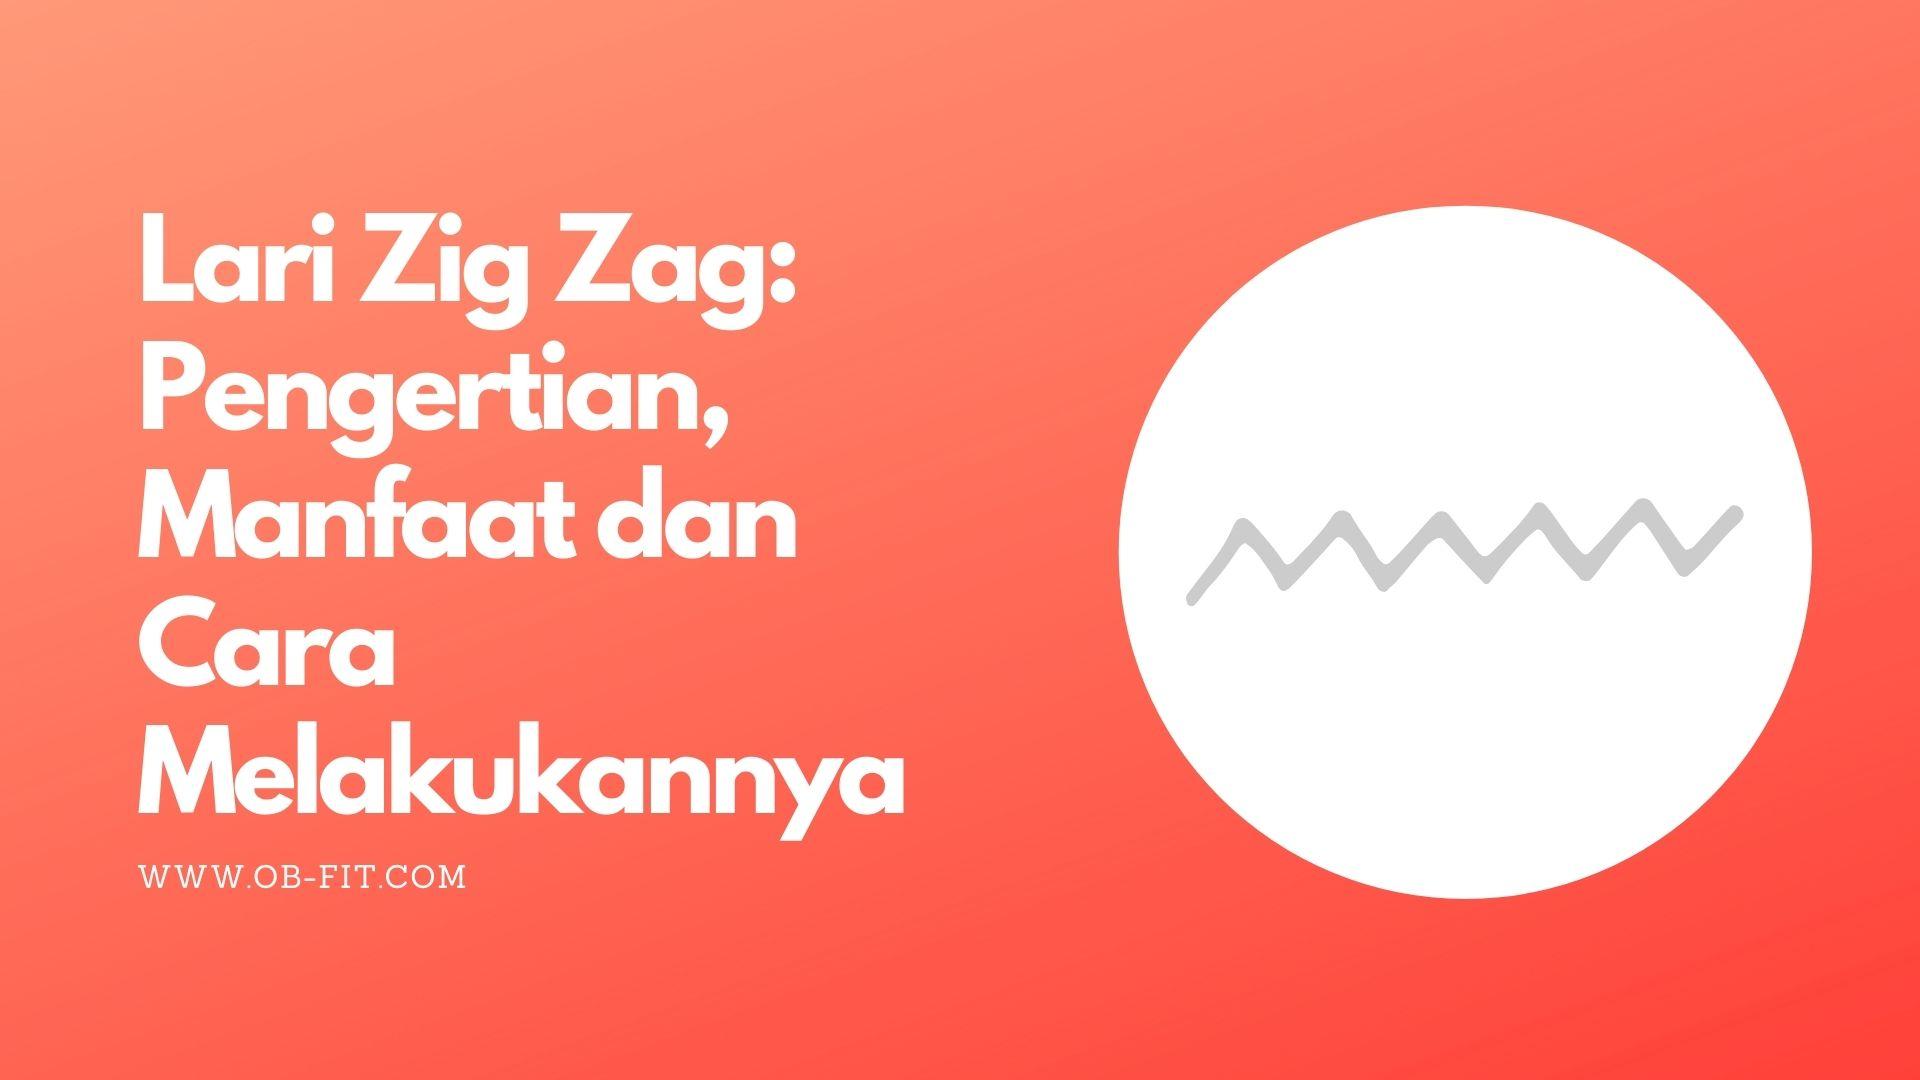 Lari Zig Zag: Pengertian, Manfaat dan Cara Melakukannya